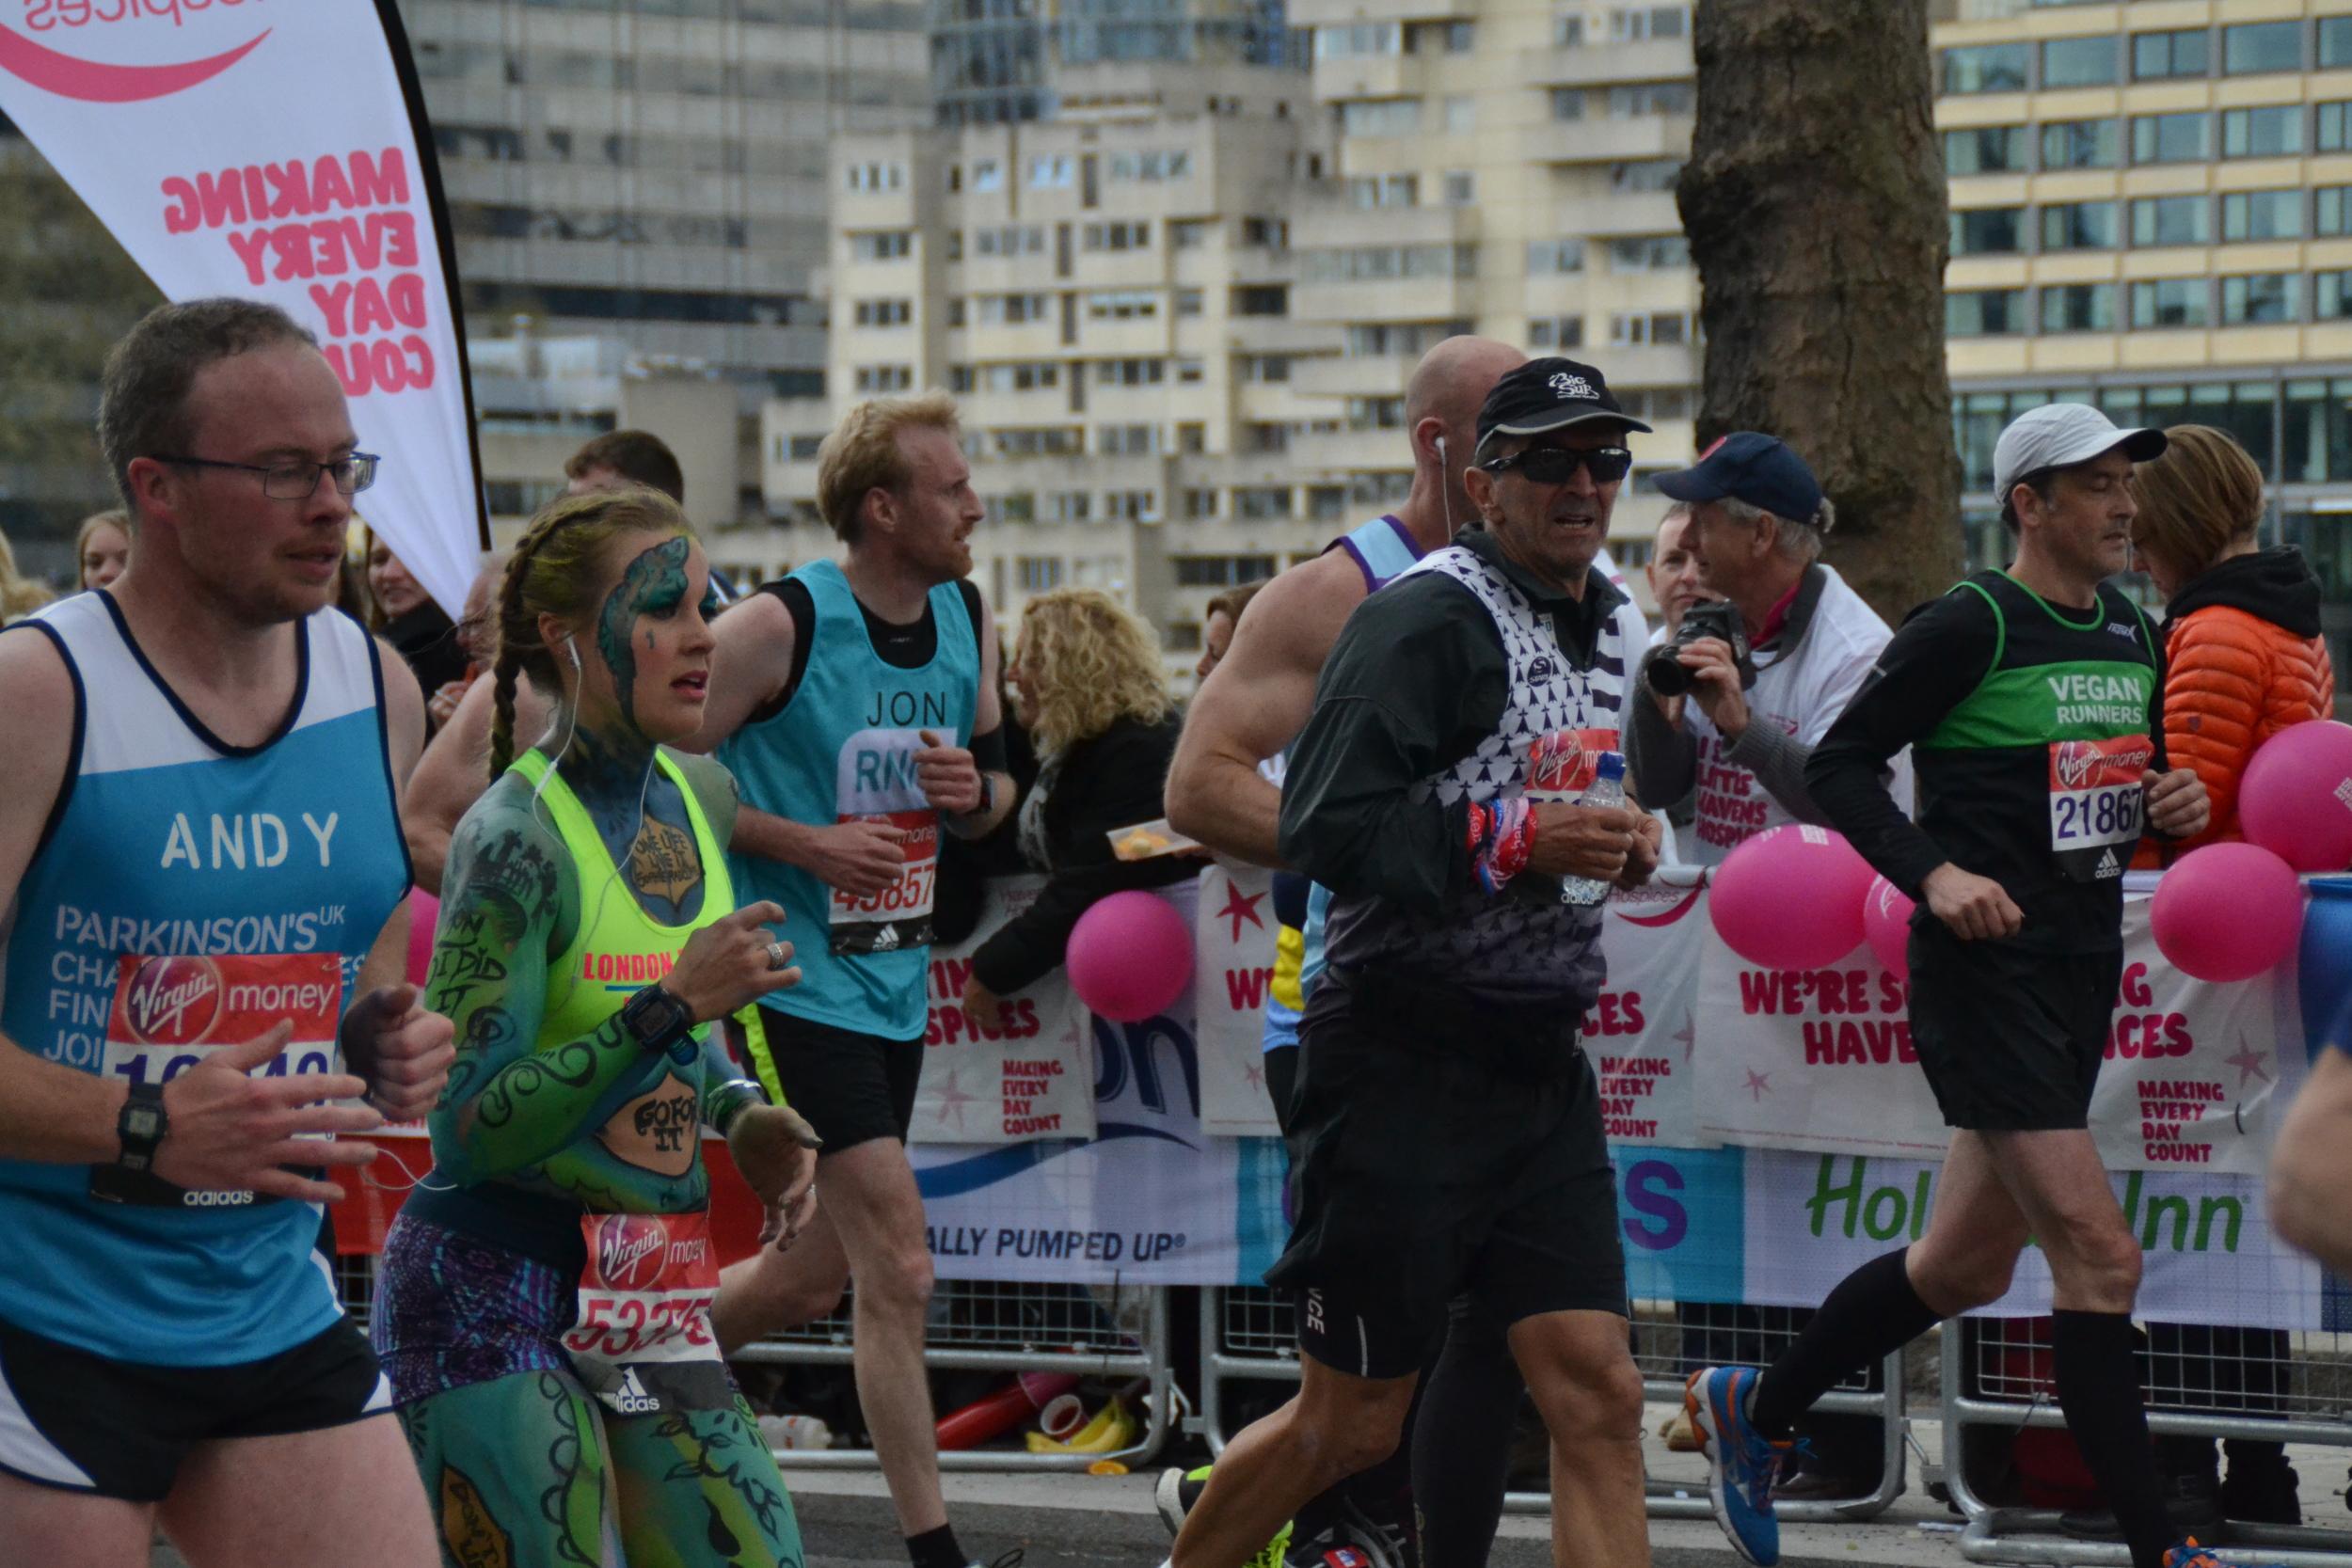 Sophie Radcliffe London Marathon, Body paint, Body Positivity